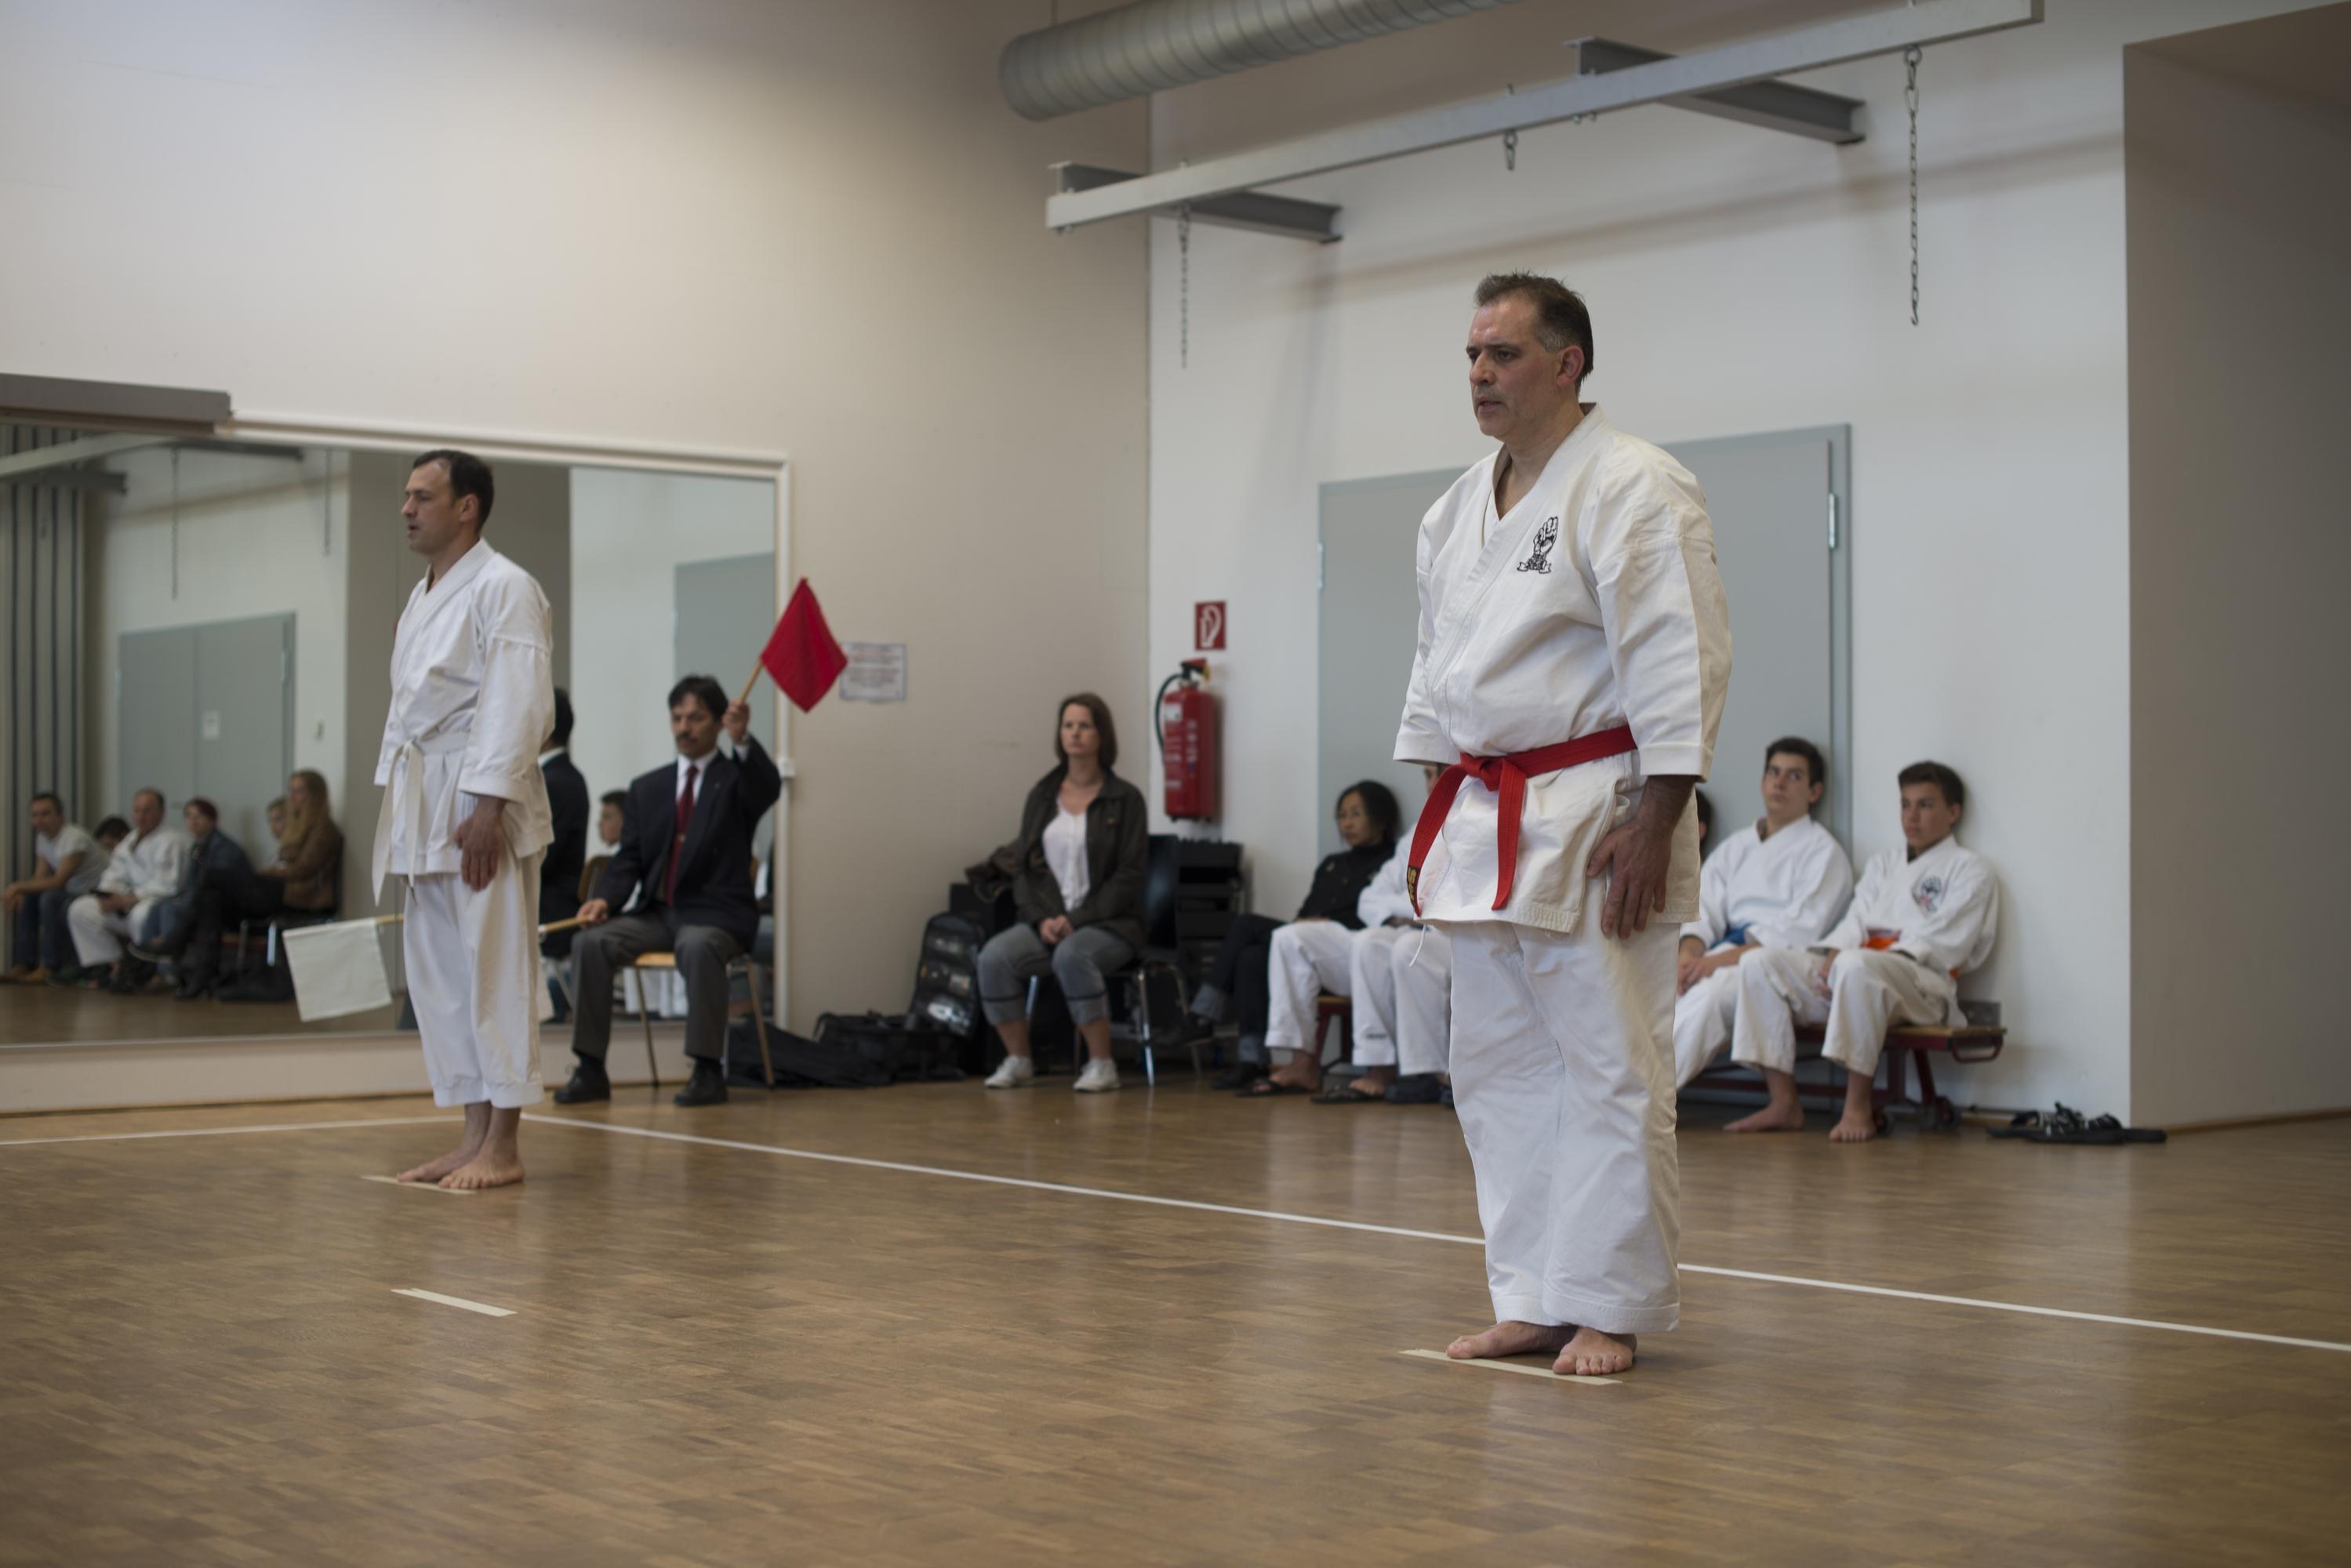 2016-04-26 Kata Turnier Kaarst 316